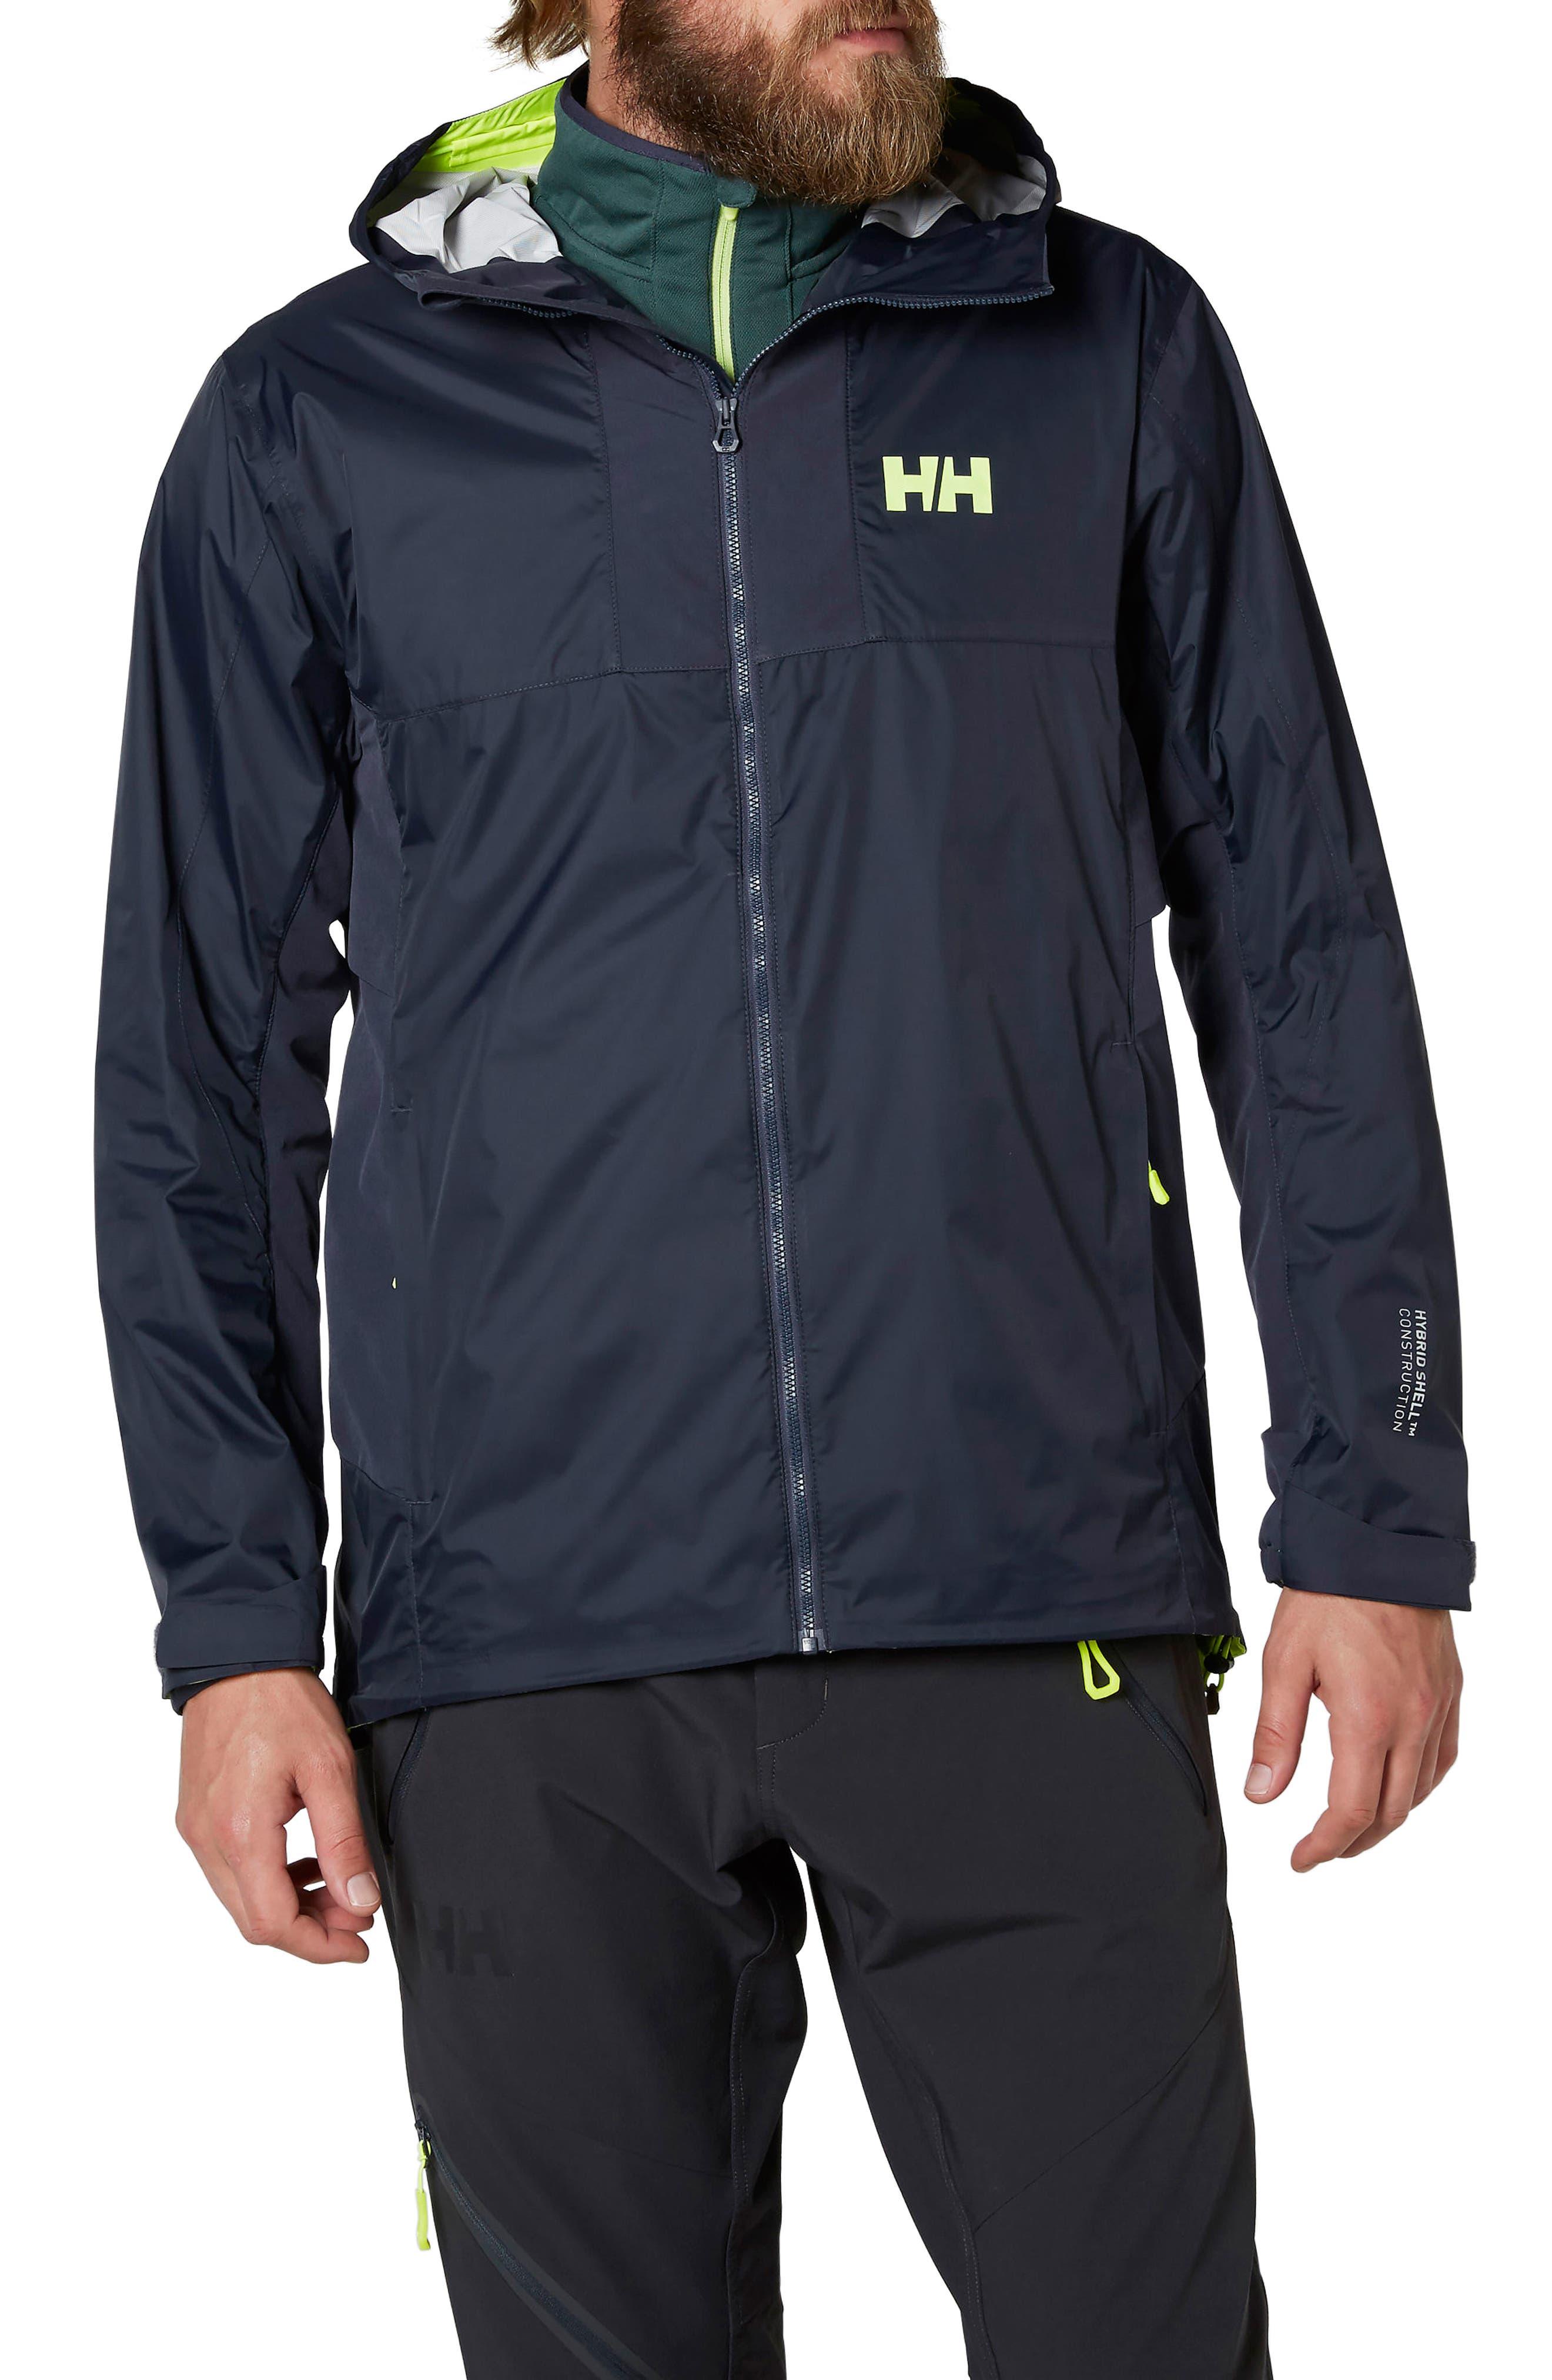 Vanir Logr Regular Fit Waterproof Jacket,                         Main,                         color, Graphite Blue